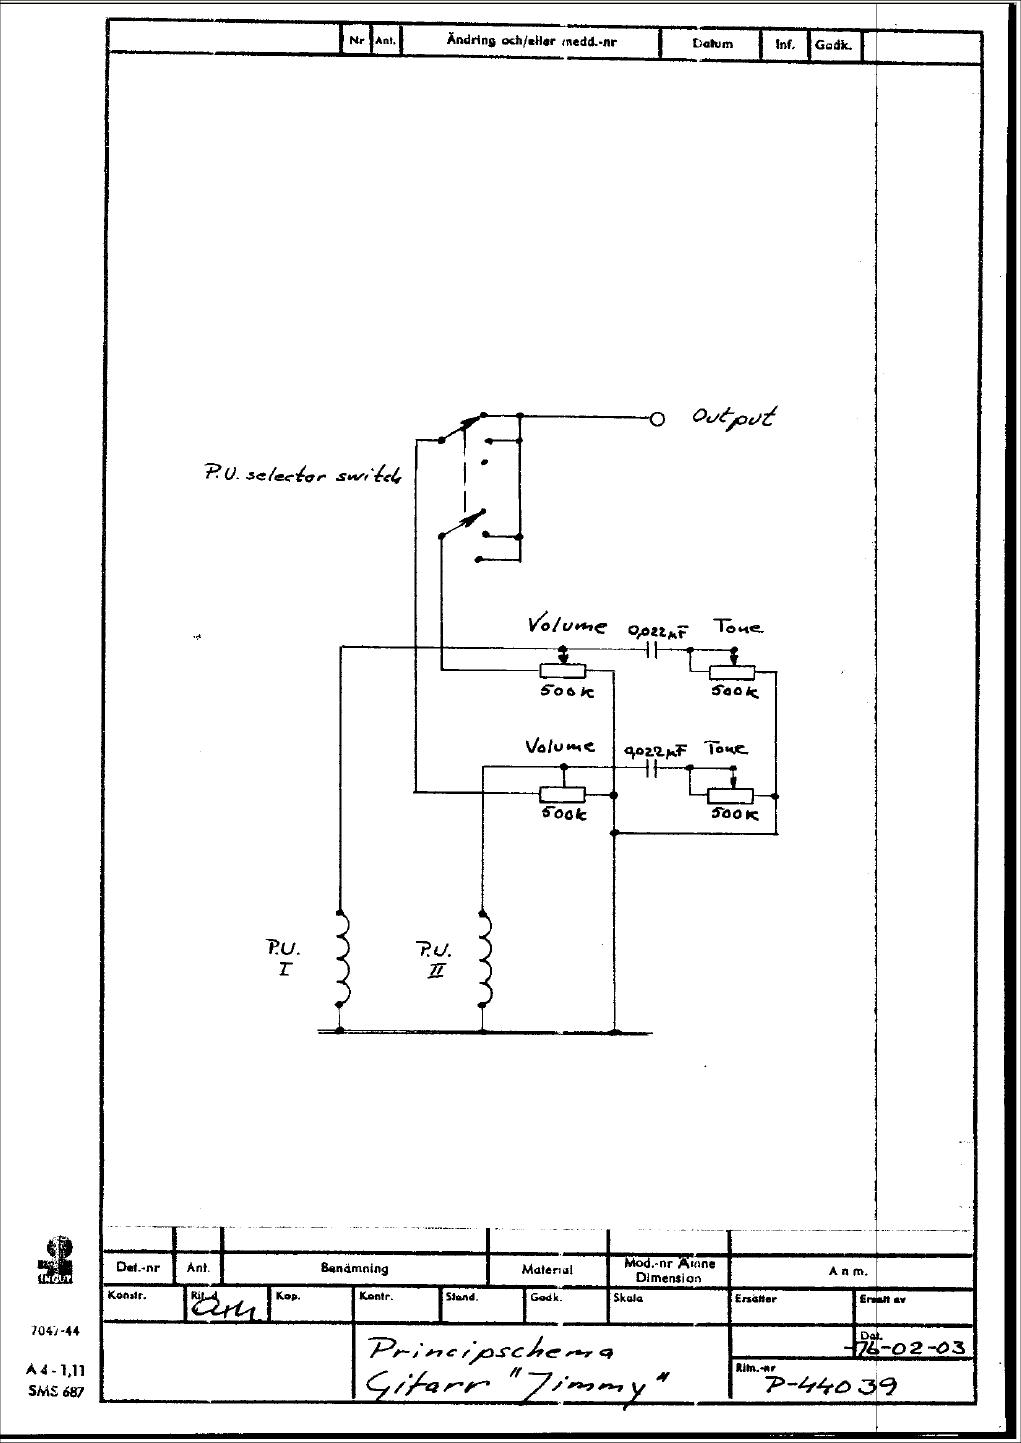 schemat /Przystawki2/Hagstrom Jimmy-1976.jpg